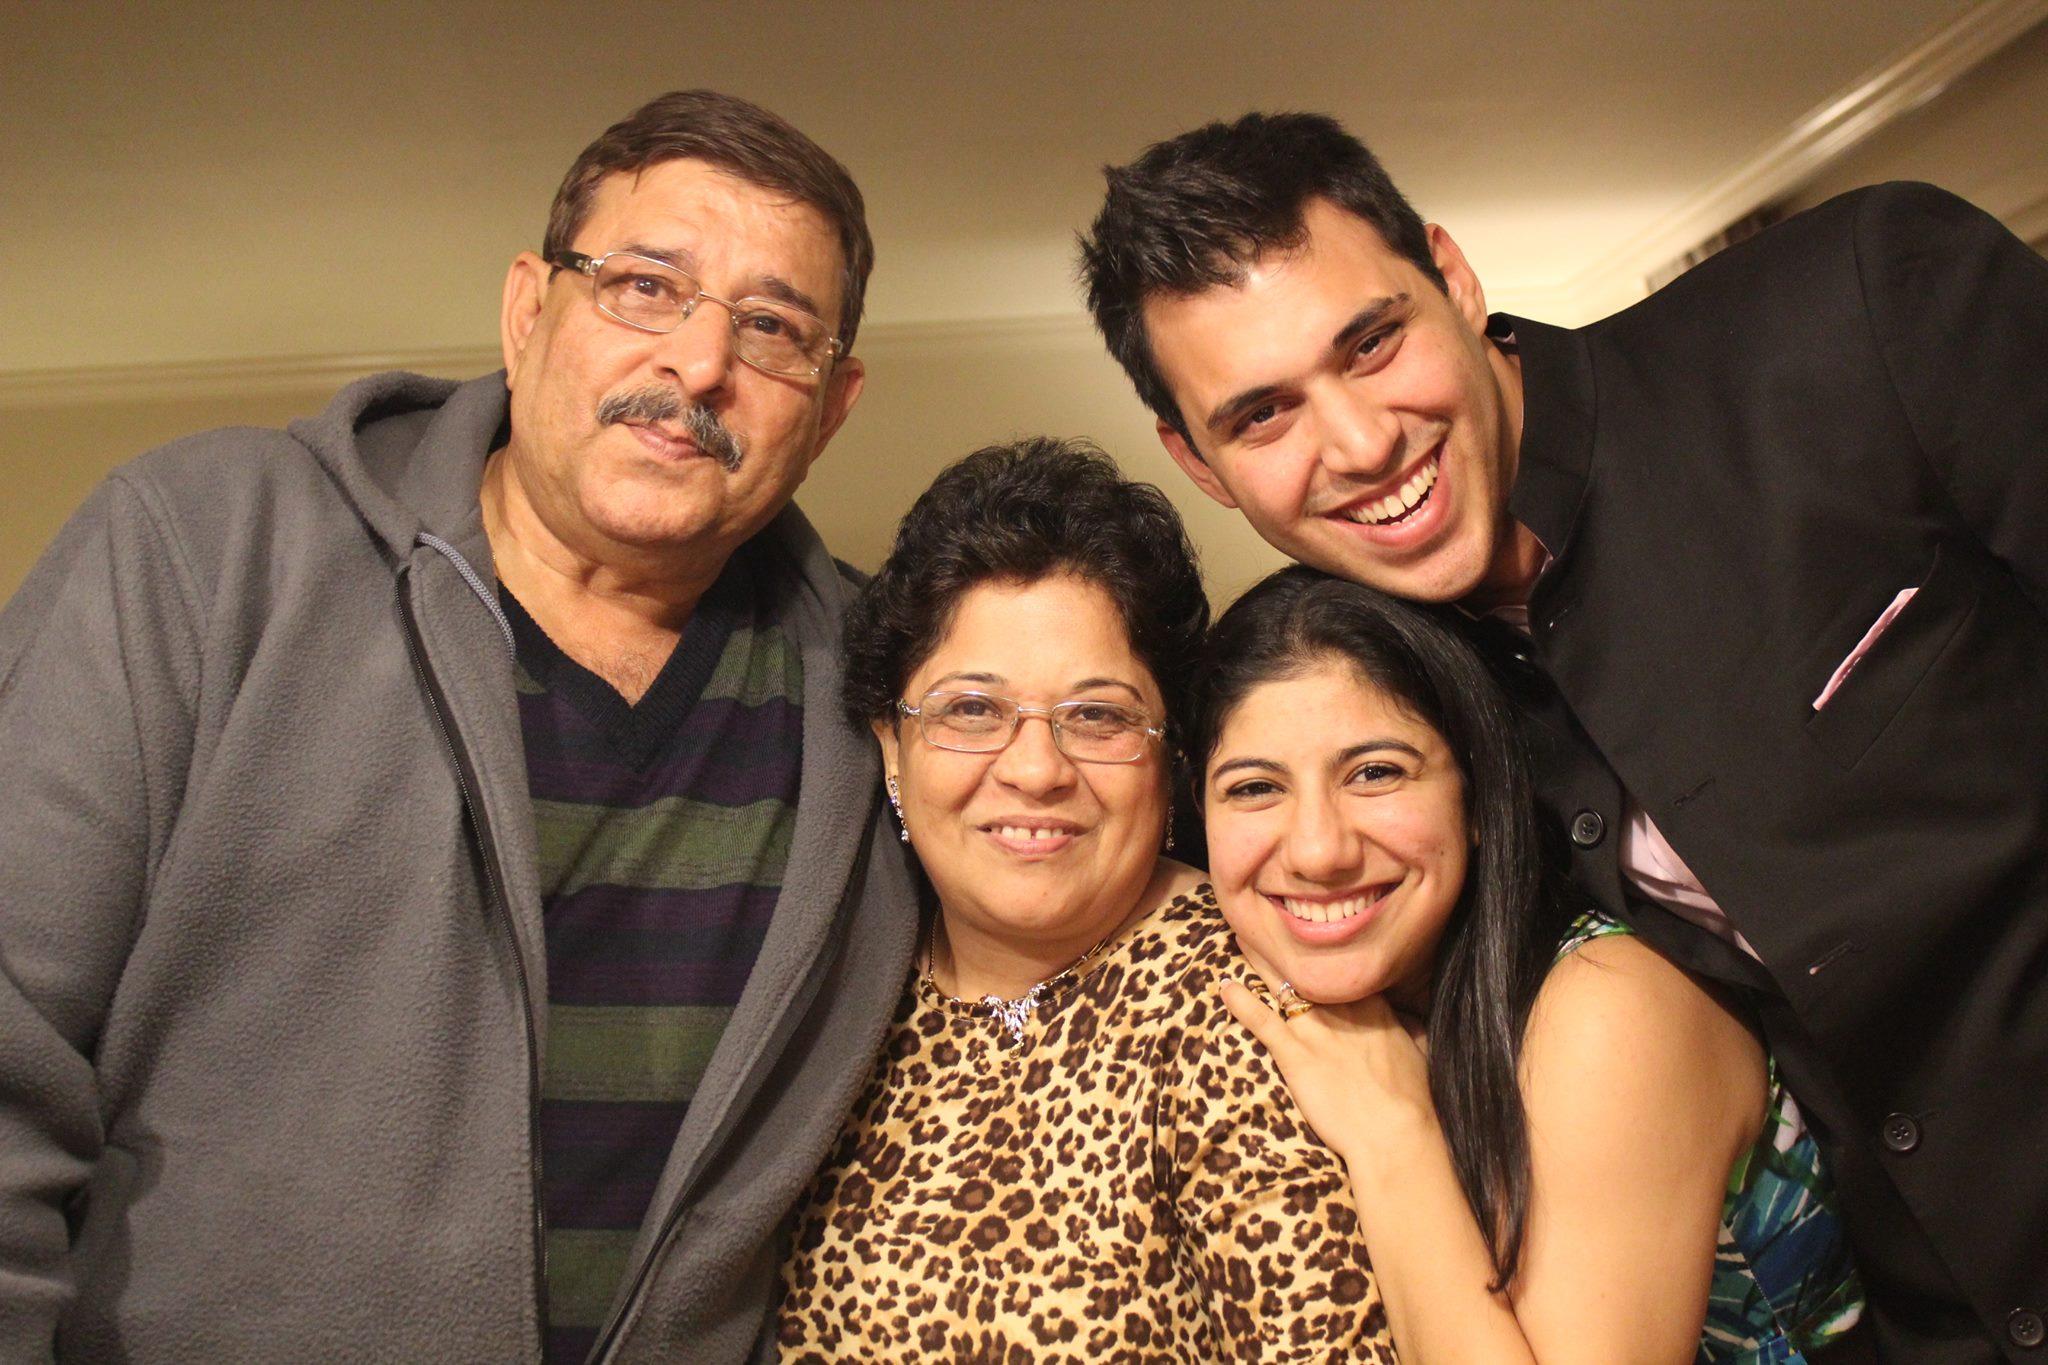 Yohan and Jasmine Vajifdar with Jasmine's parents